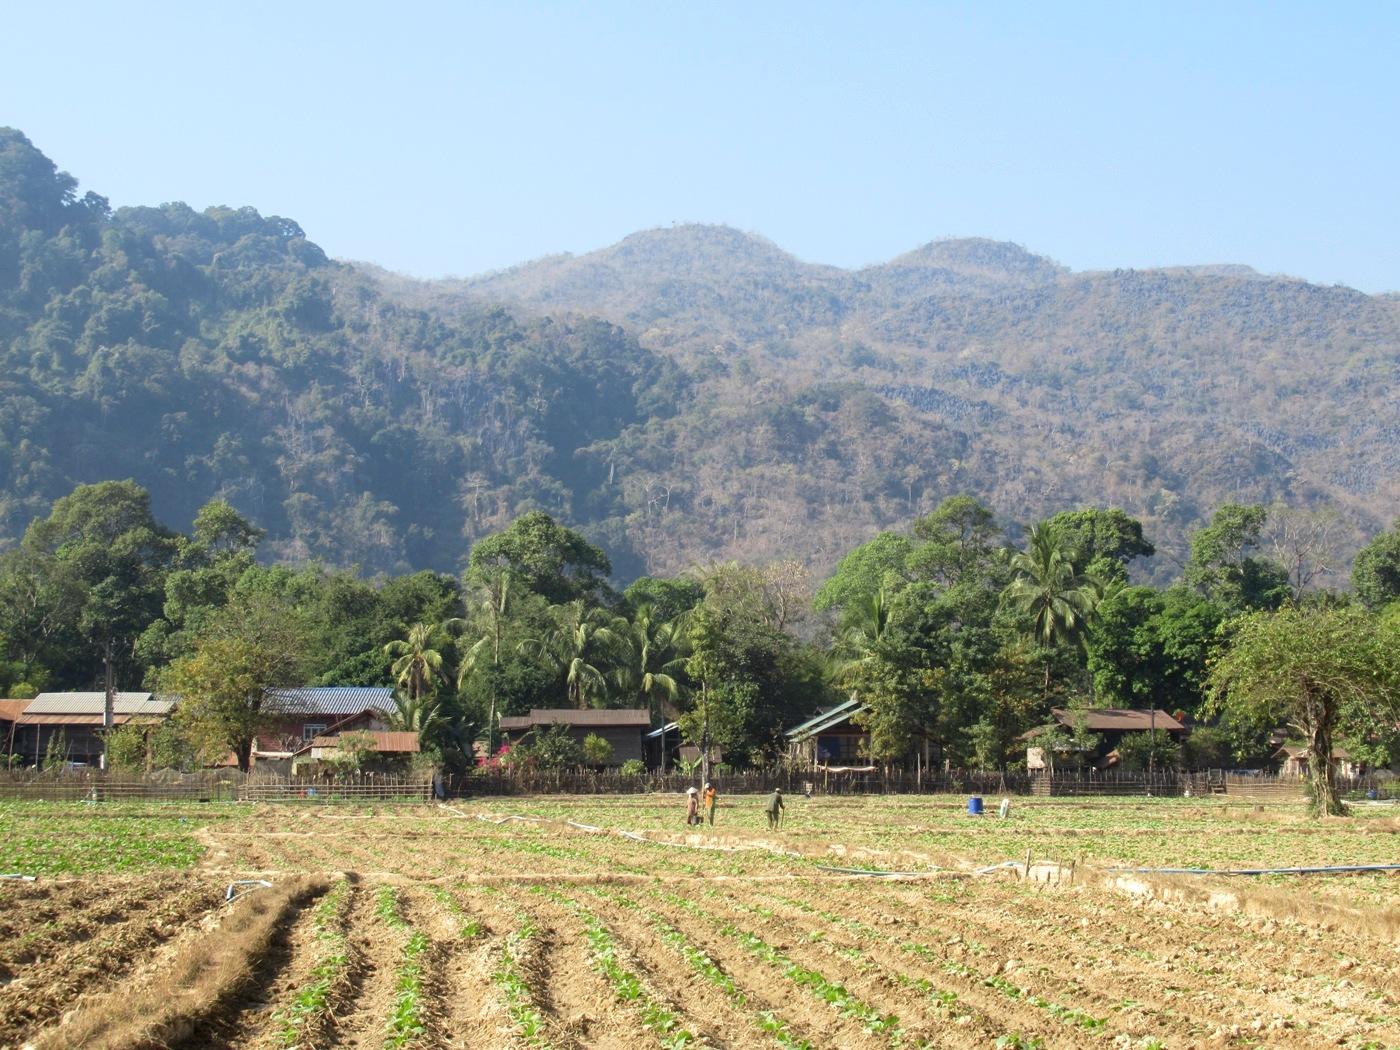 2019-12-laos-thakhek-loop-dia-4-03-carretera